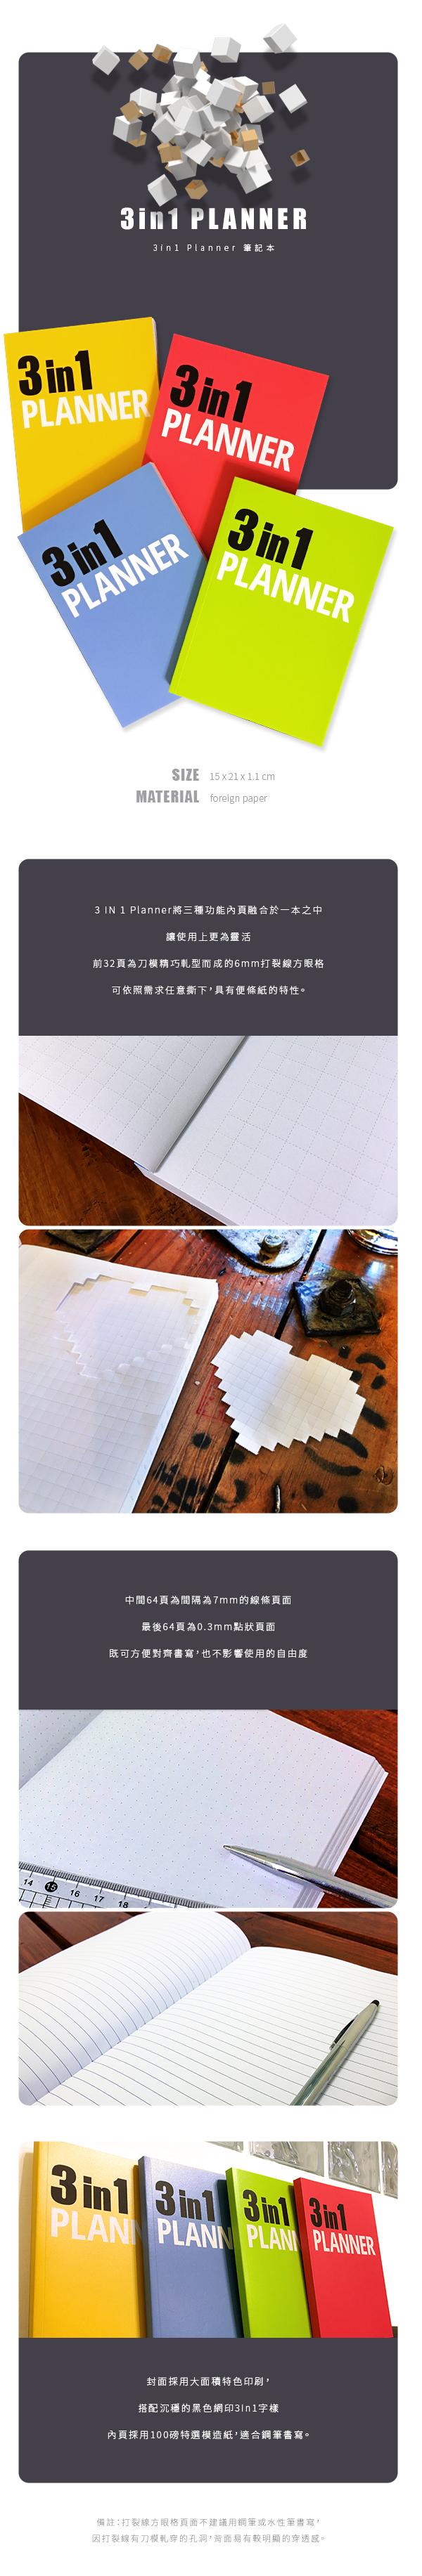 Norns Nuts【吾人設計 3in1 Planner筆記本】文創 手帳 管理 行事曆 筆記本